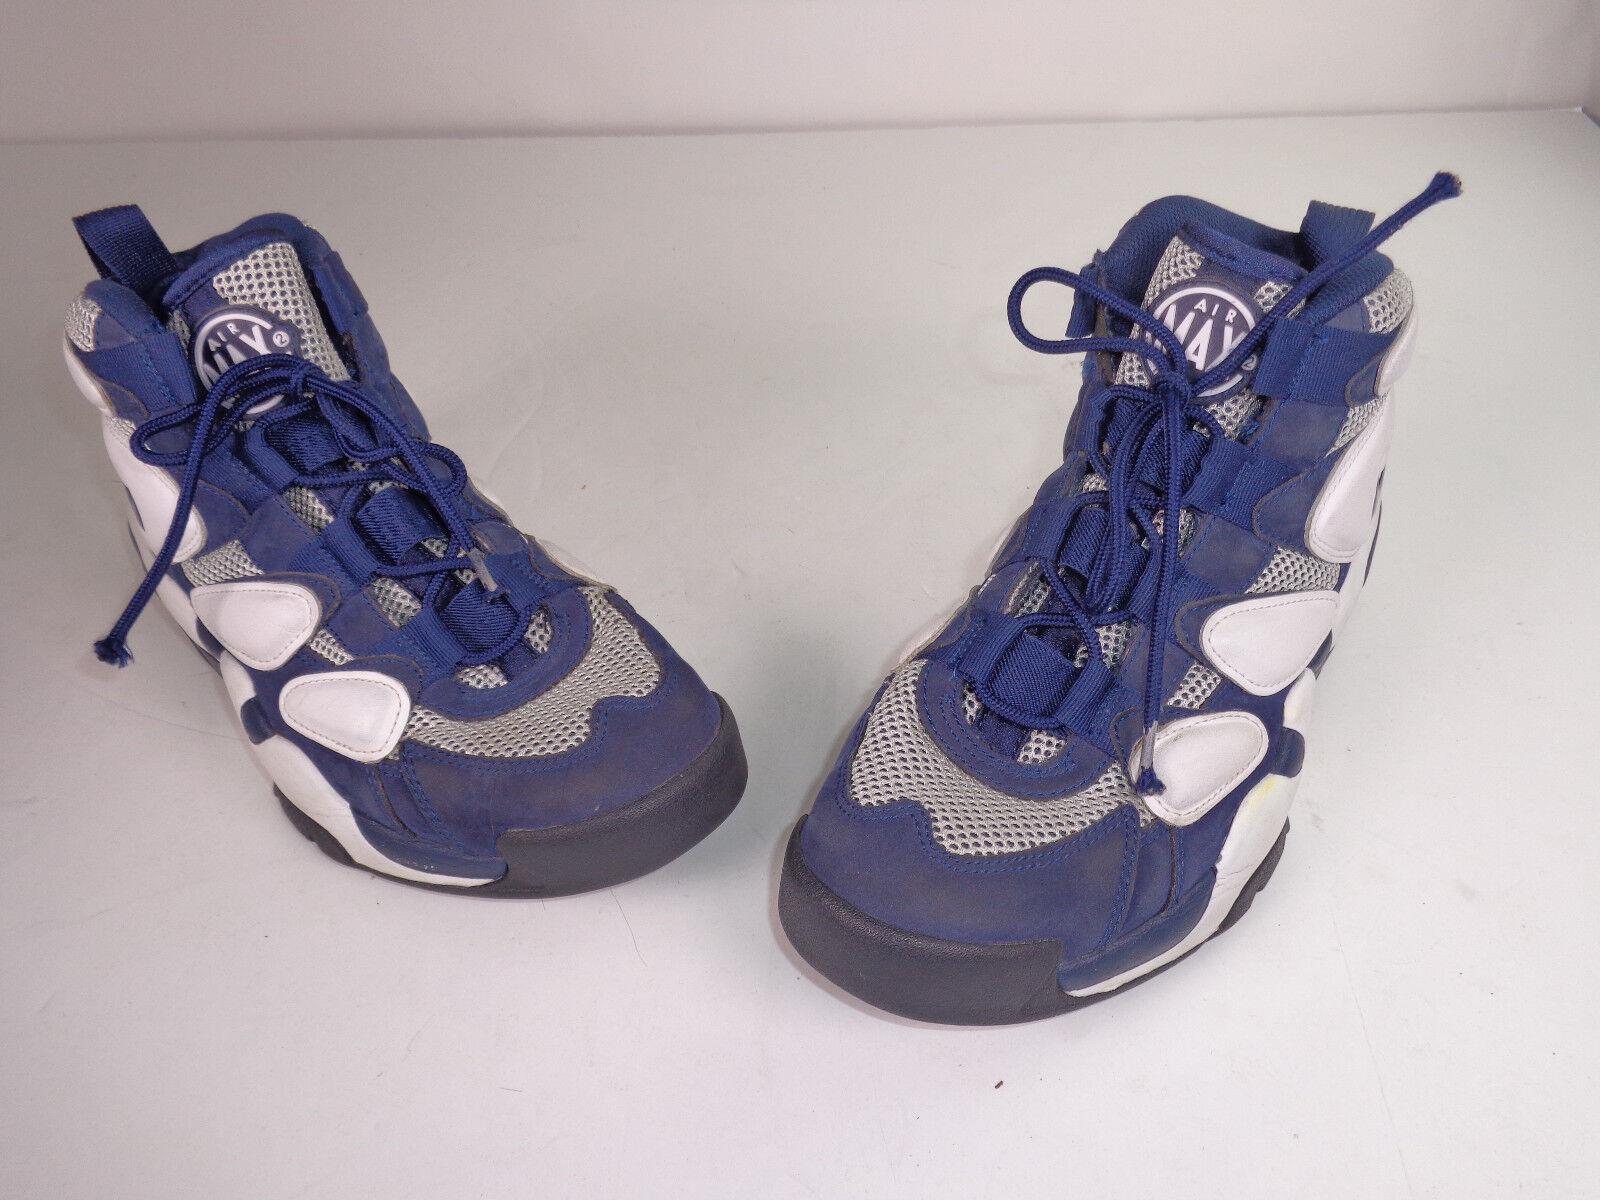 Nike air marina max ritmo 2 mezzanotte marina air / bianco / grigio neutro 315861-411 misura 8,5 3c40c3